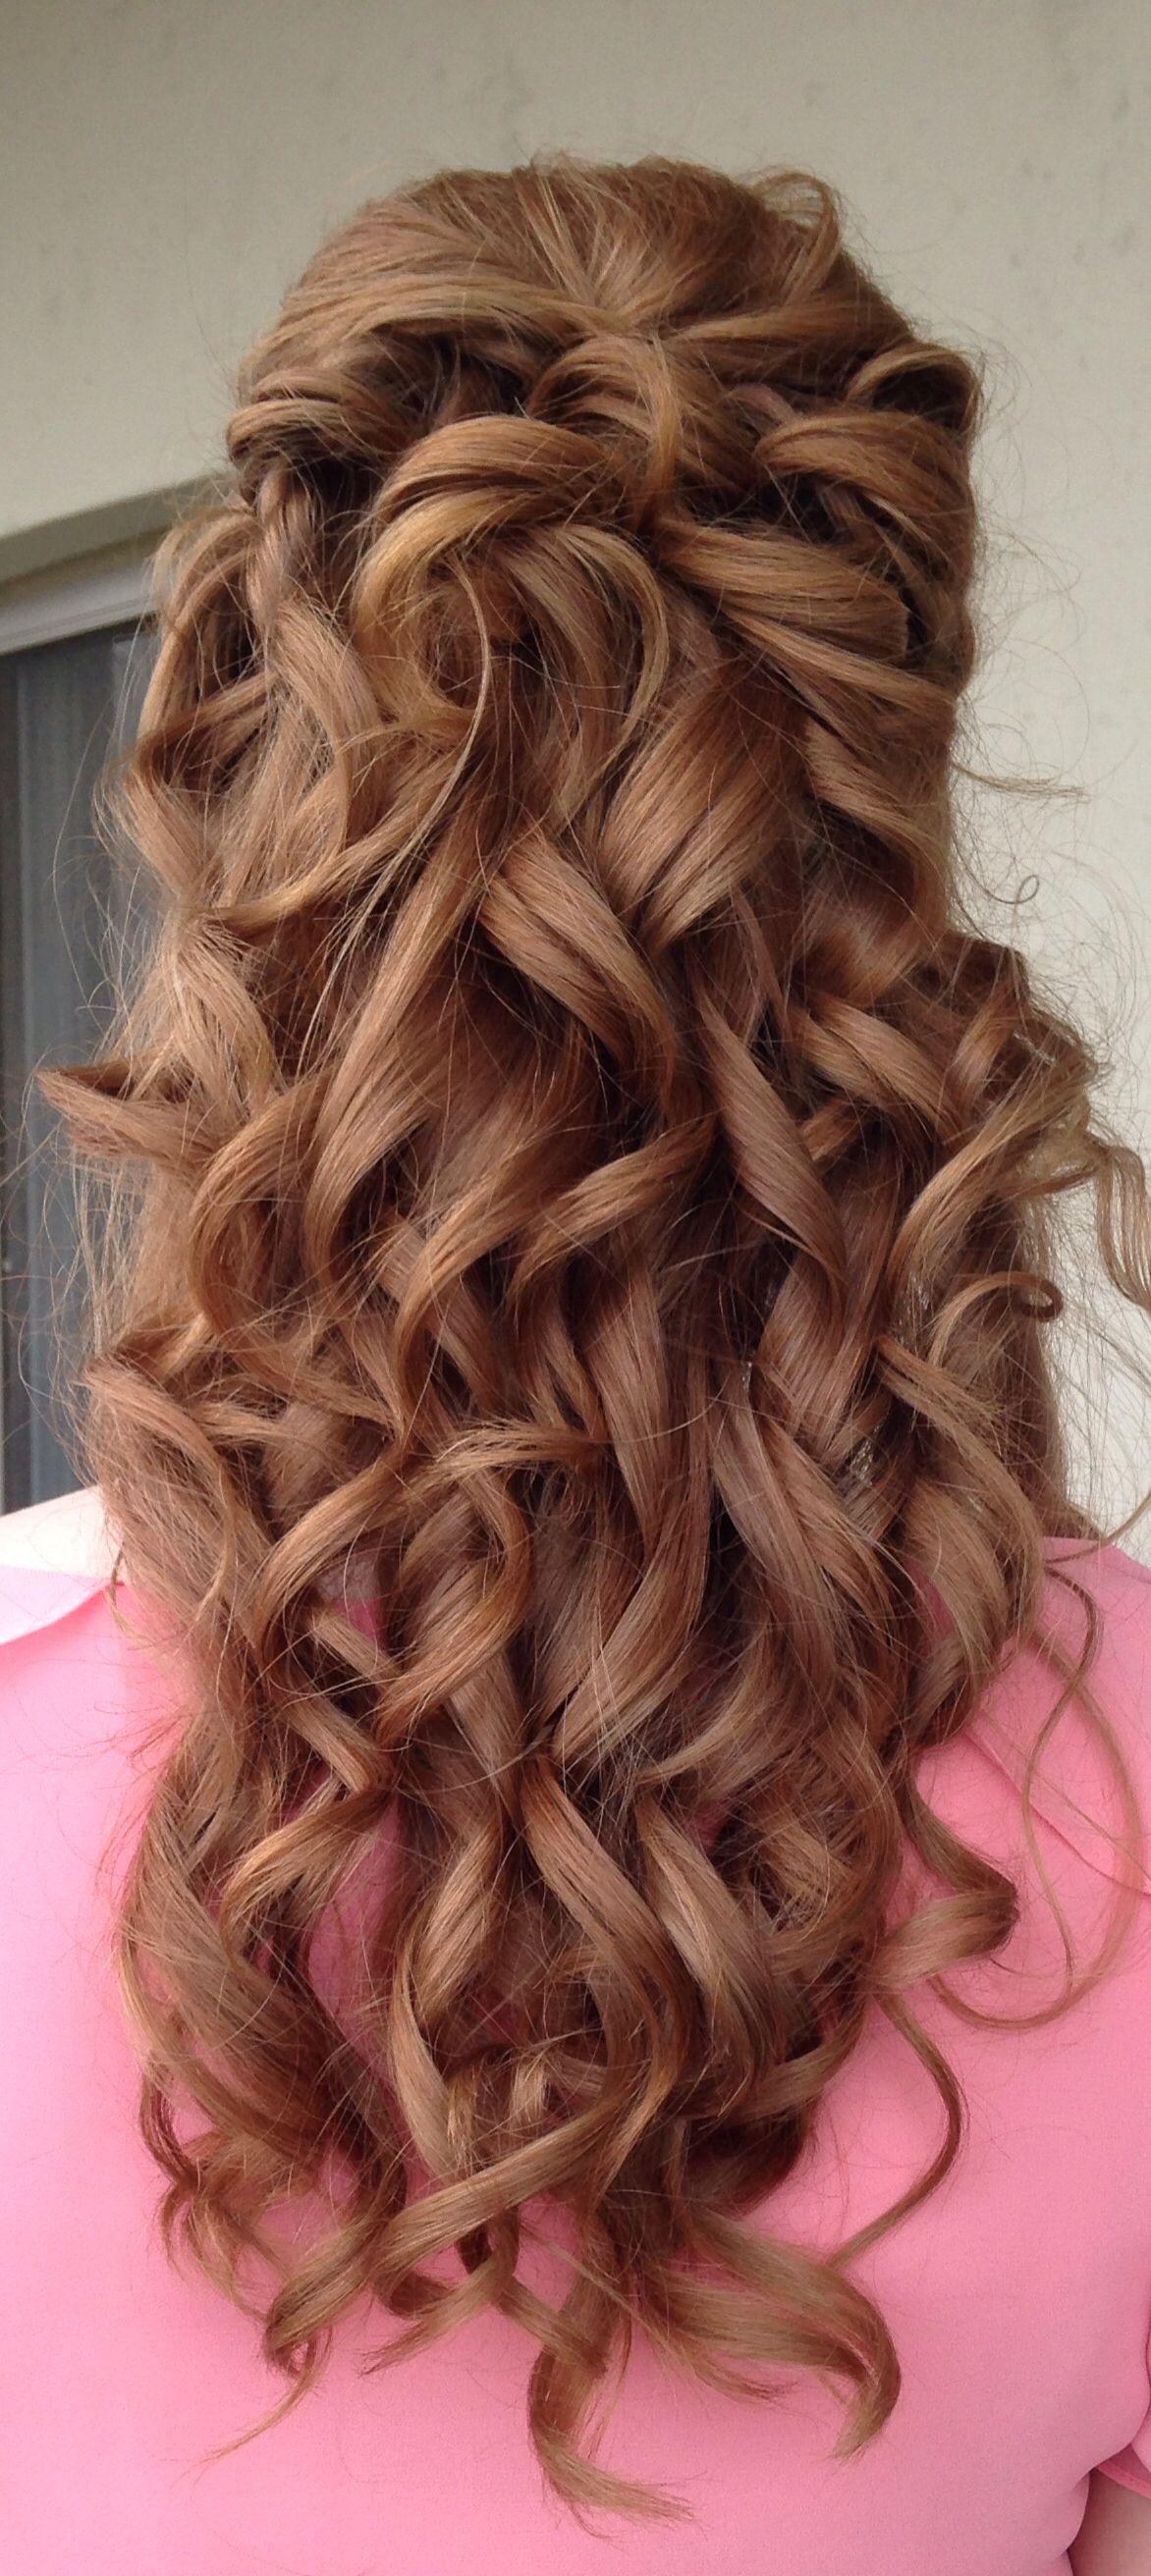 bridalshower bridal shower updo curls half-up updo upstyle bride